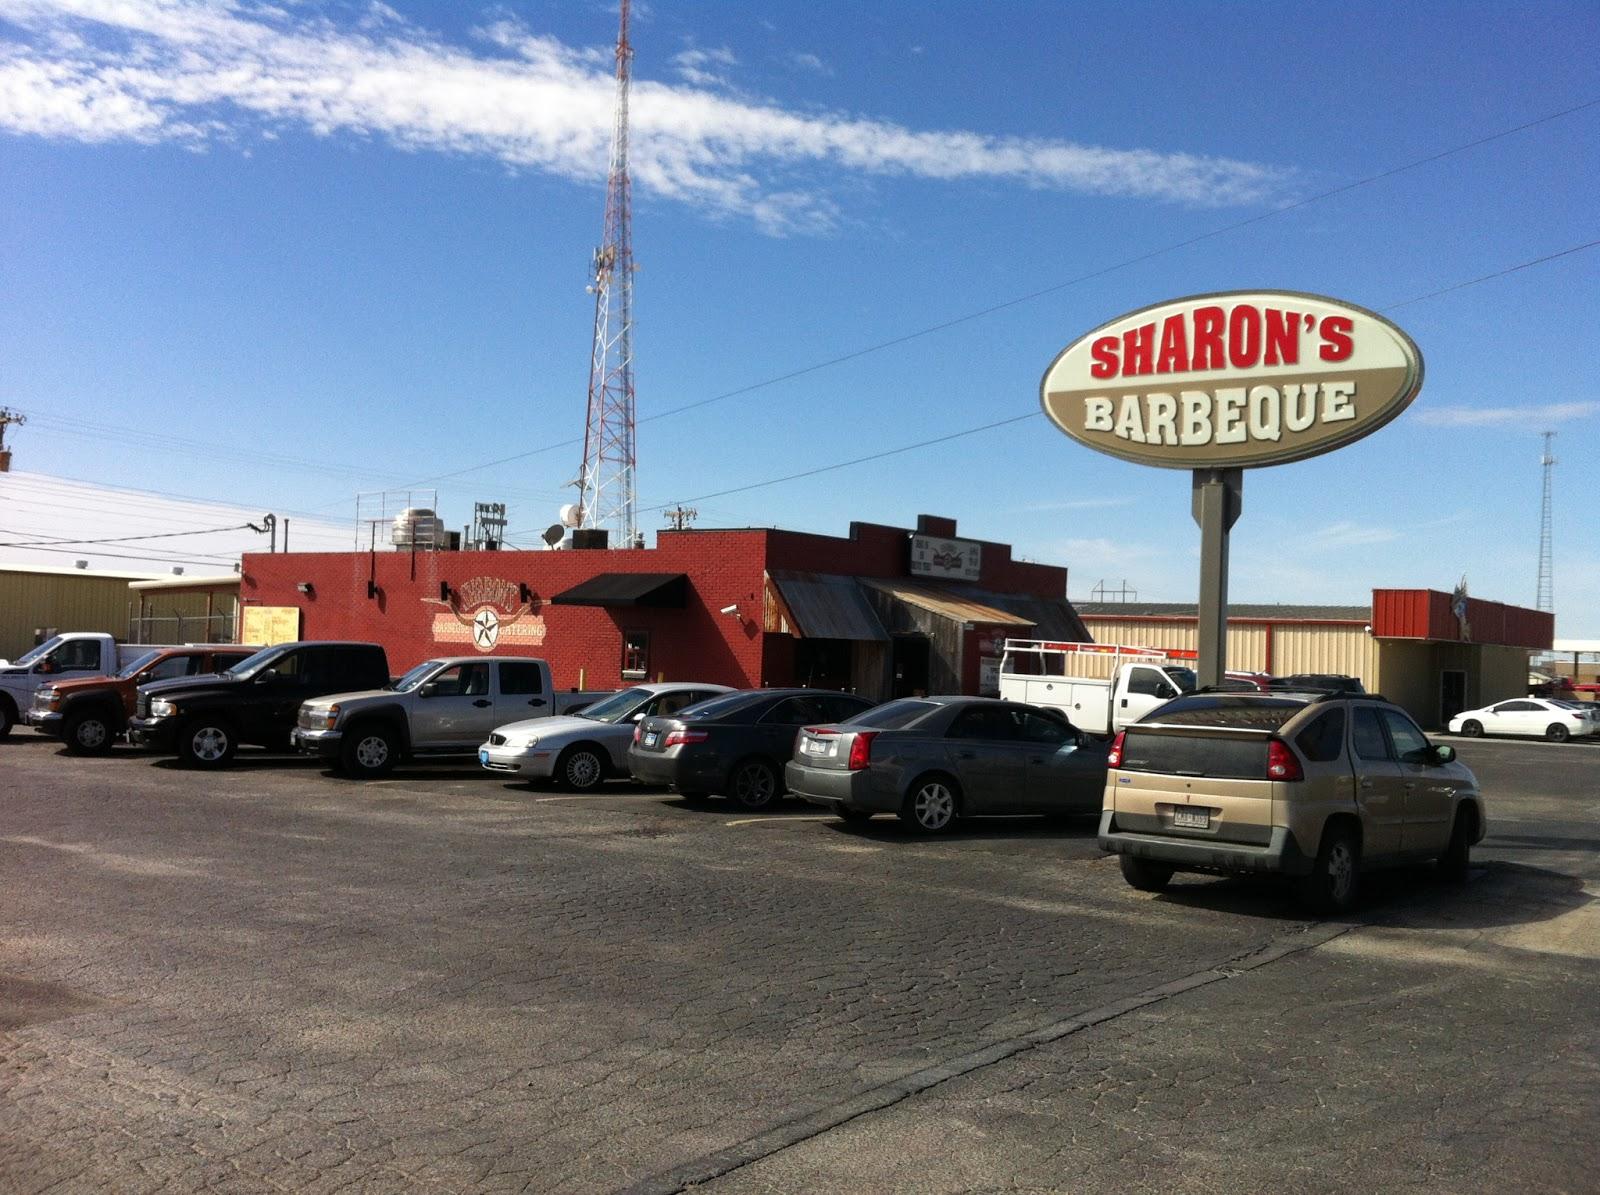 Sharon Barbeque Abilene Barbecue BBQ Bar-B-Que